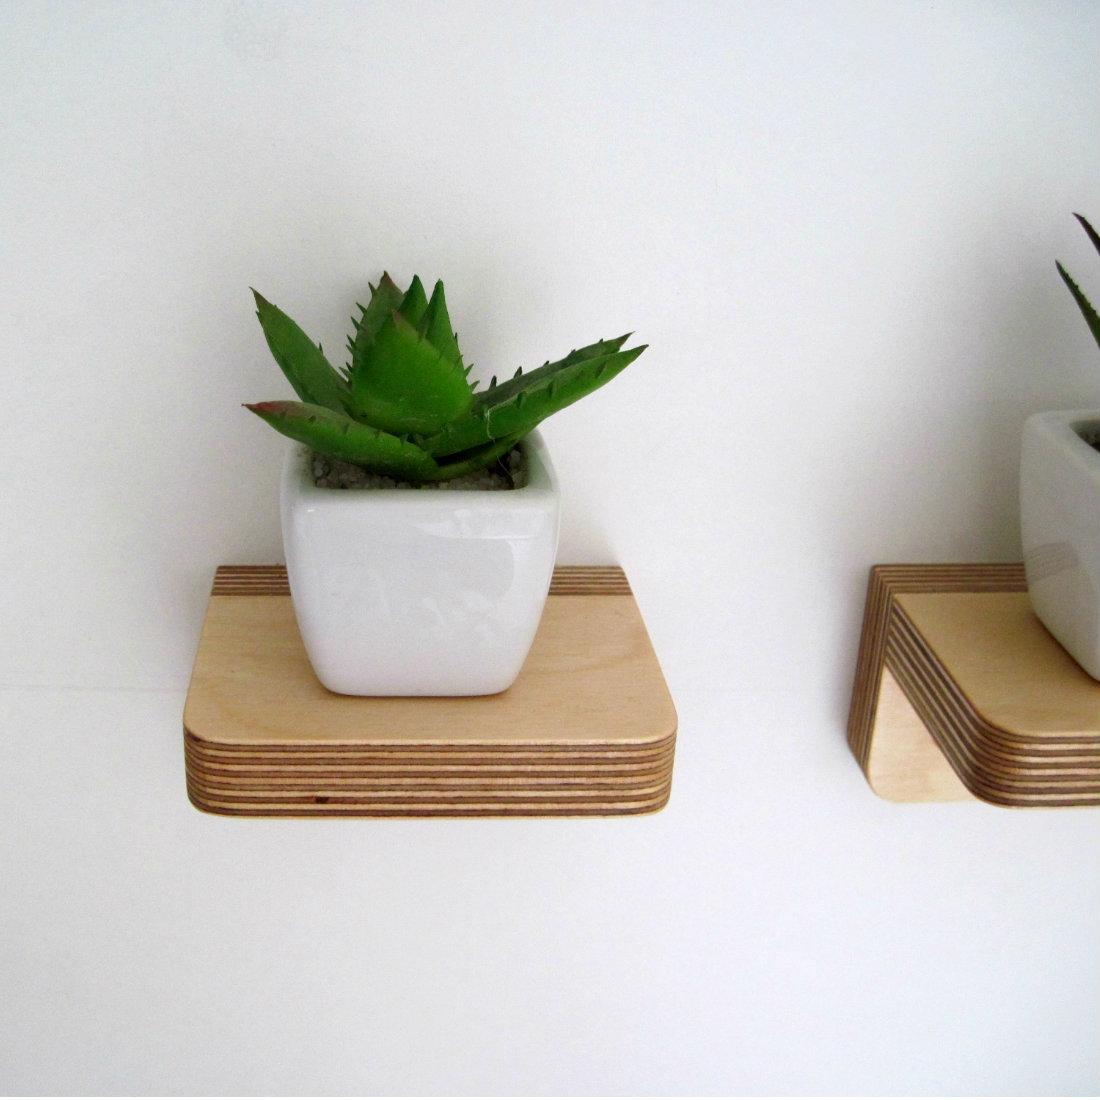 Piccolo Shelf designed by Samuel and Sarah Ansbacher from brightblueliving.com